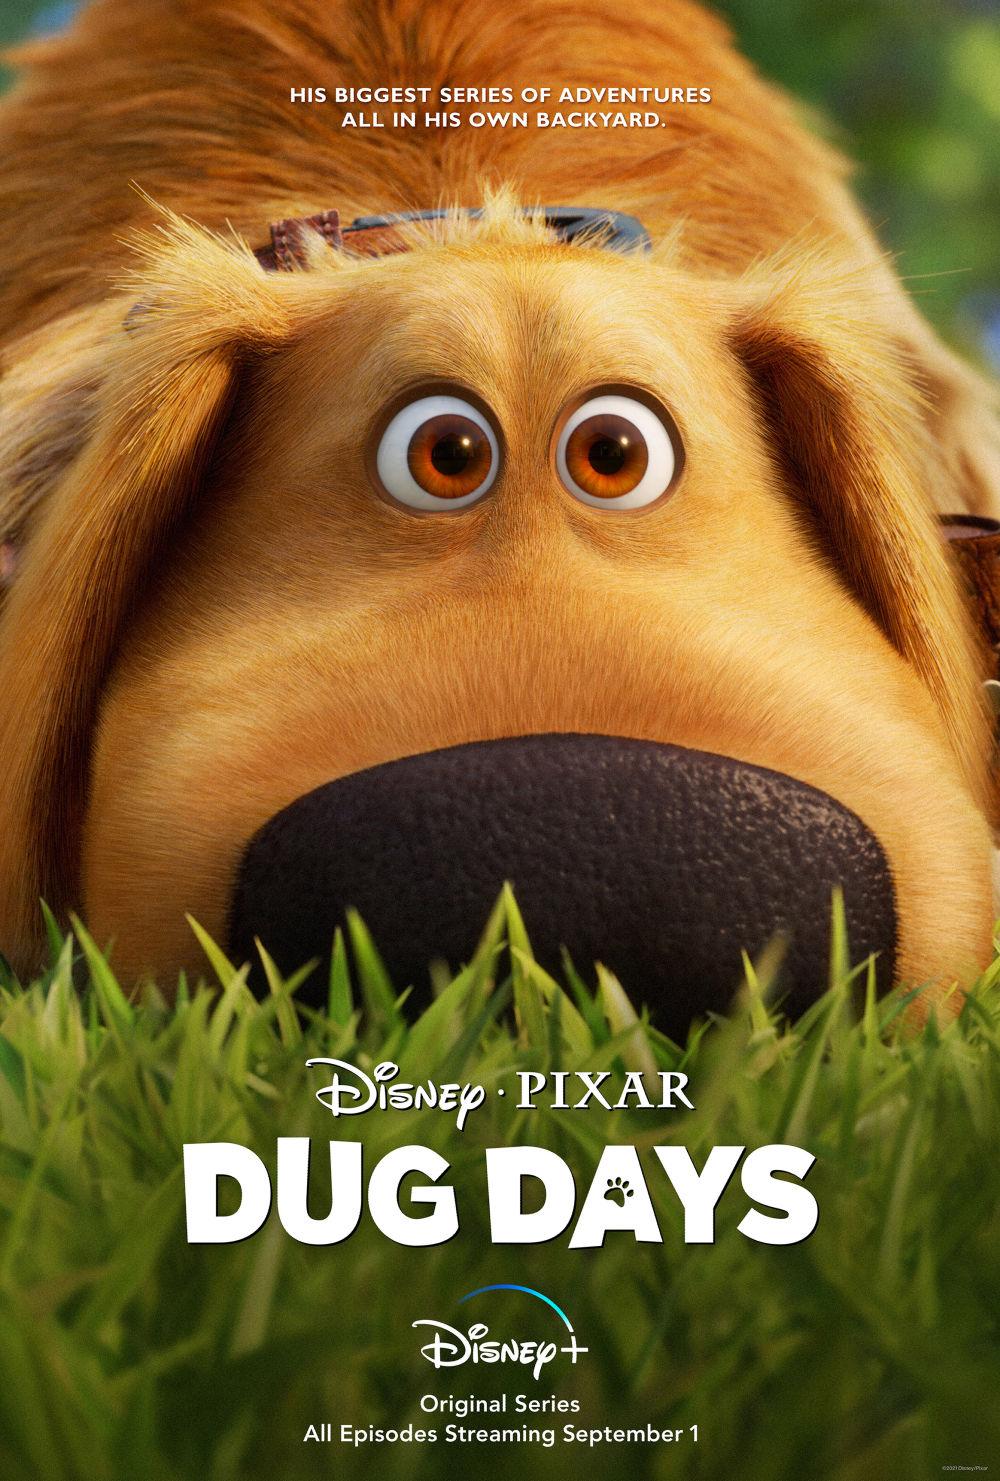 Dug Days premieres on Disney+ on Sept. 1